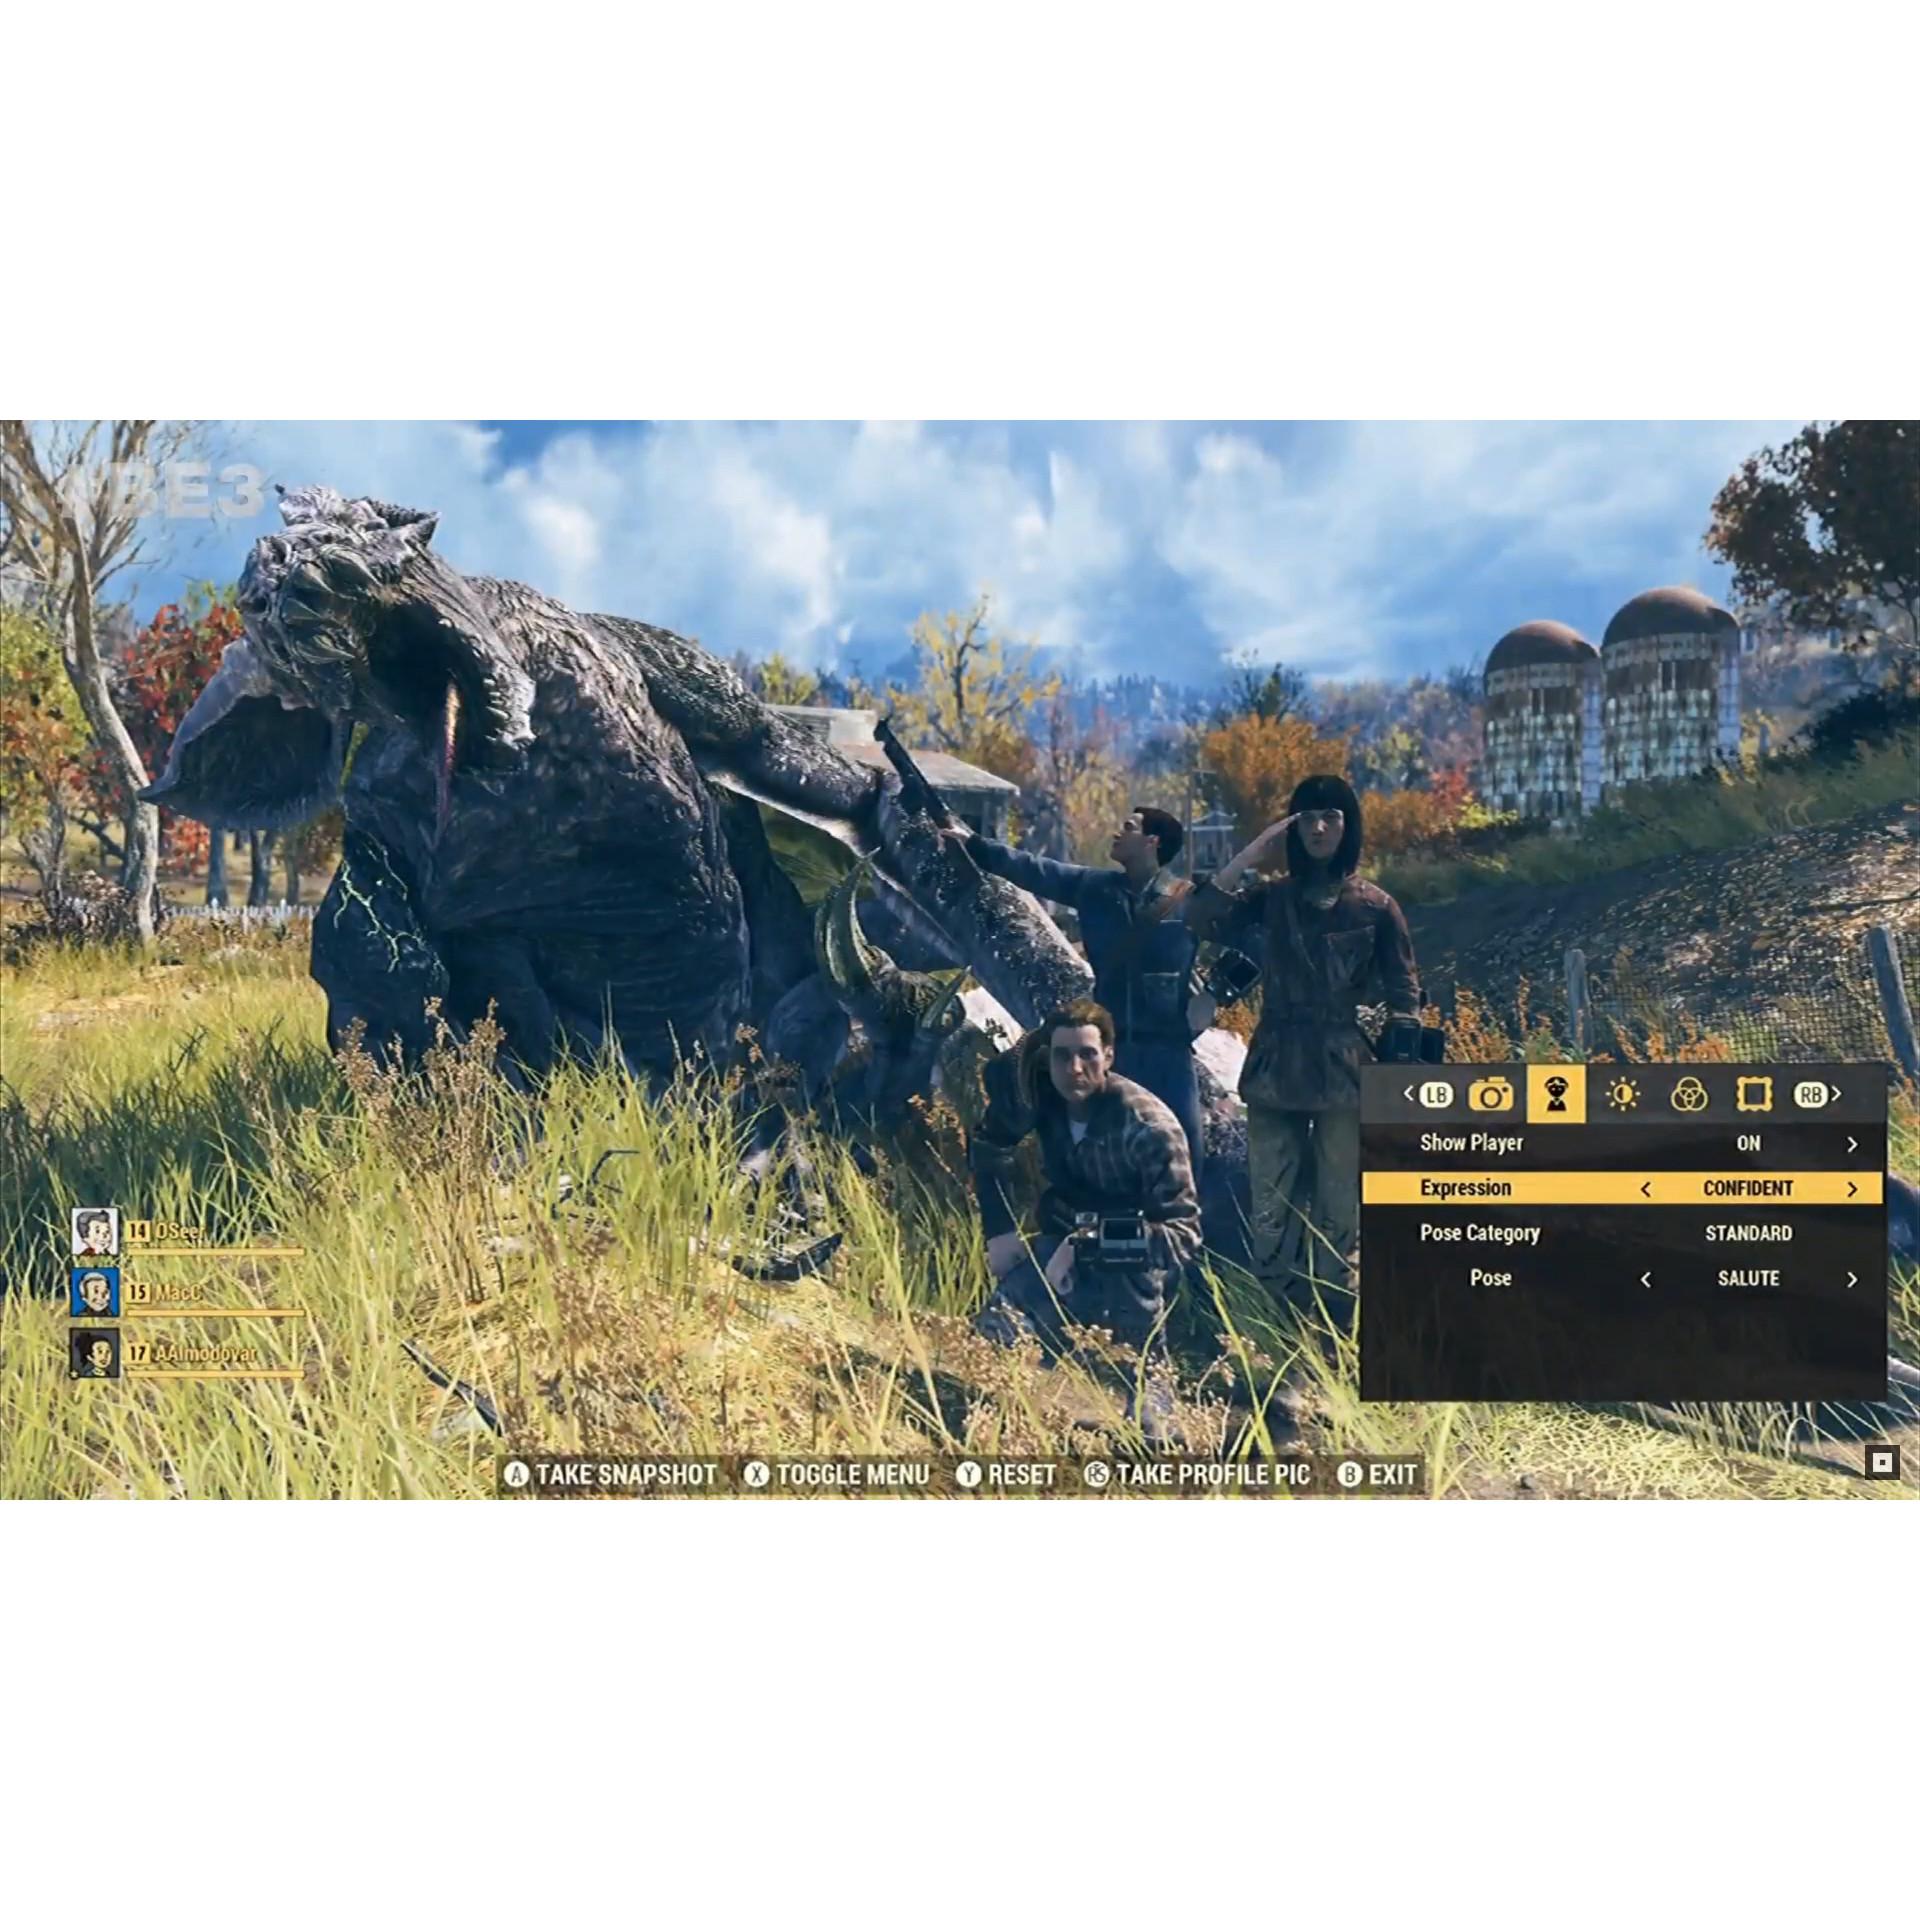 Joc Fallout 76 EU Bethesda CD Key Pentru Calculator 1